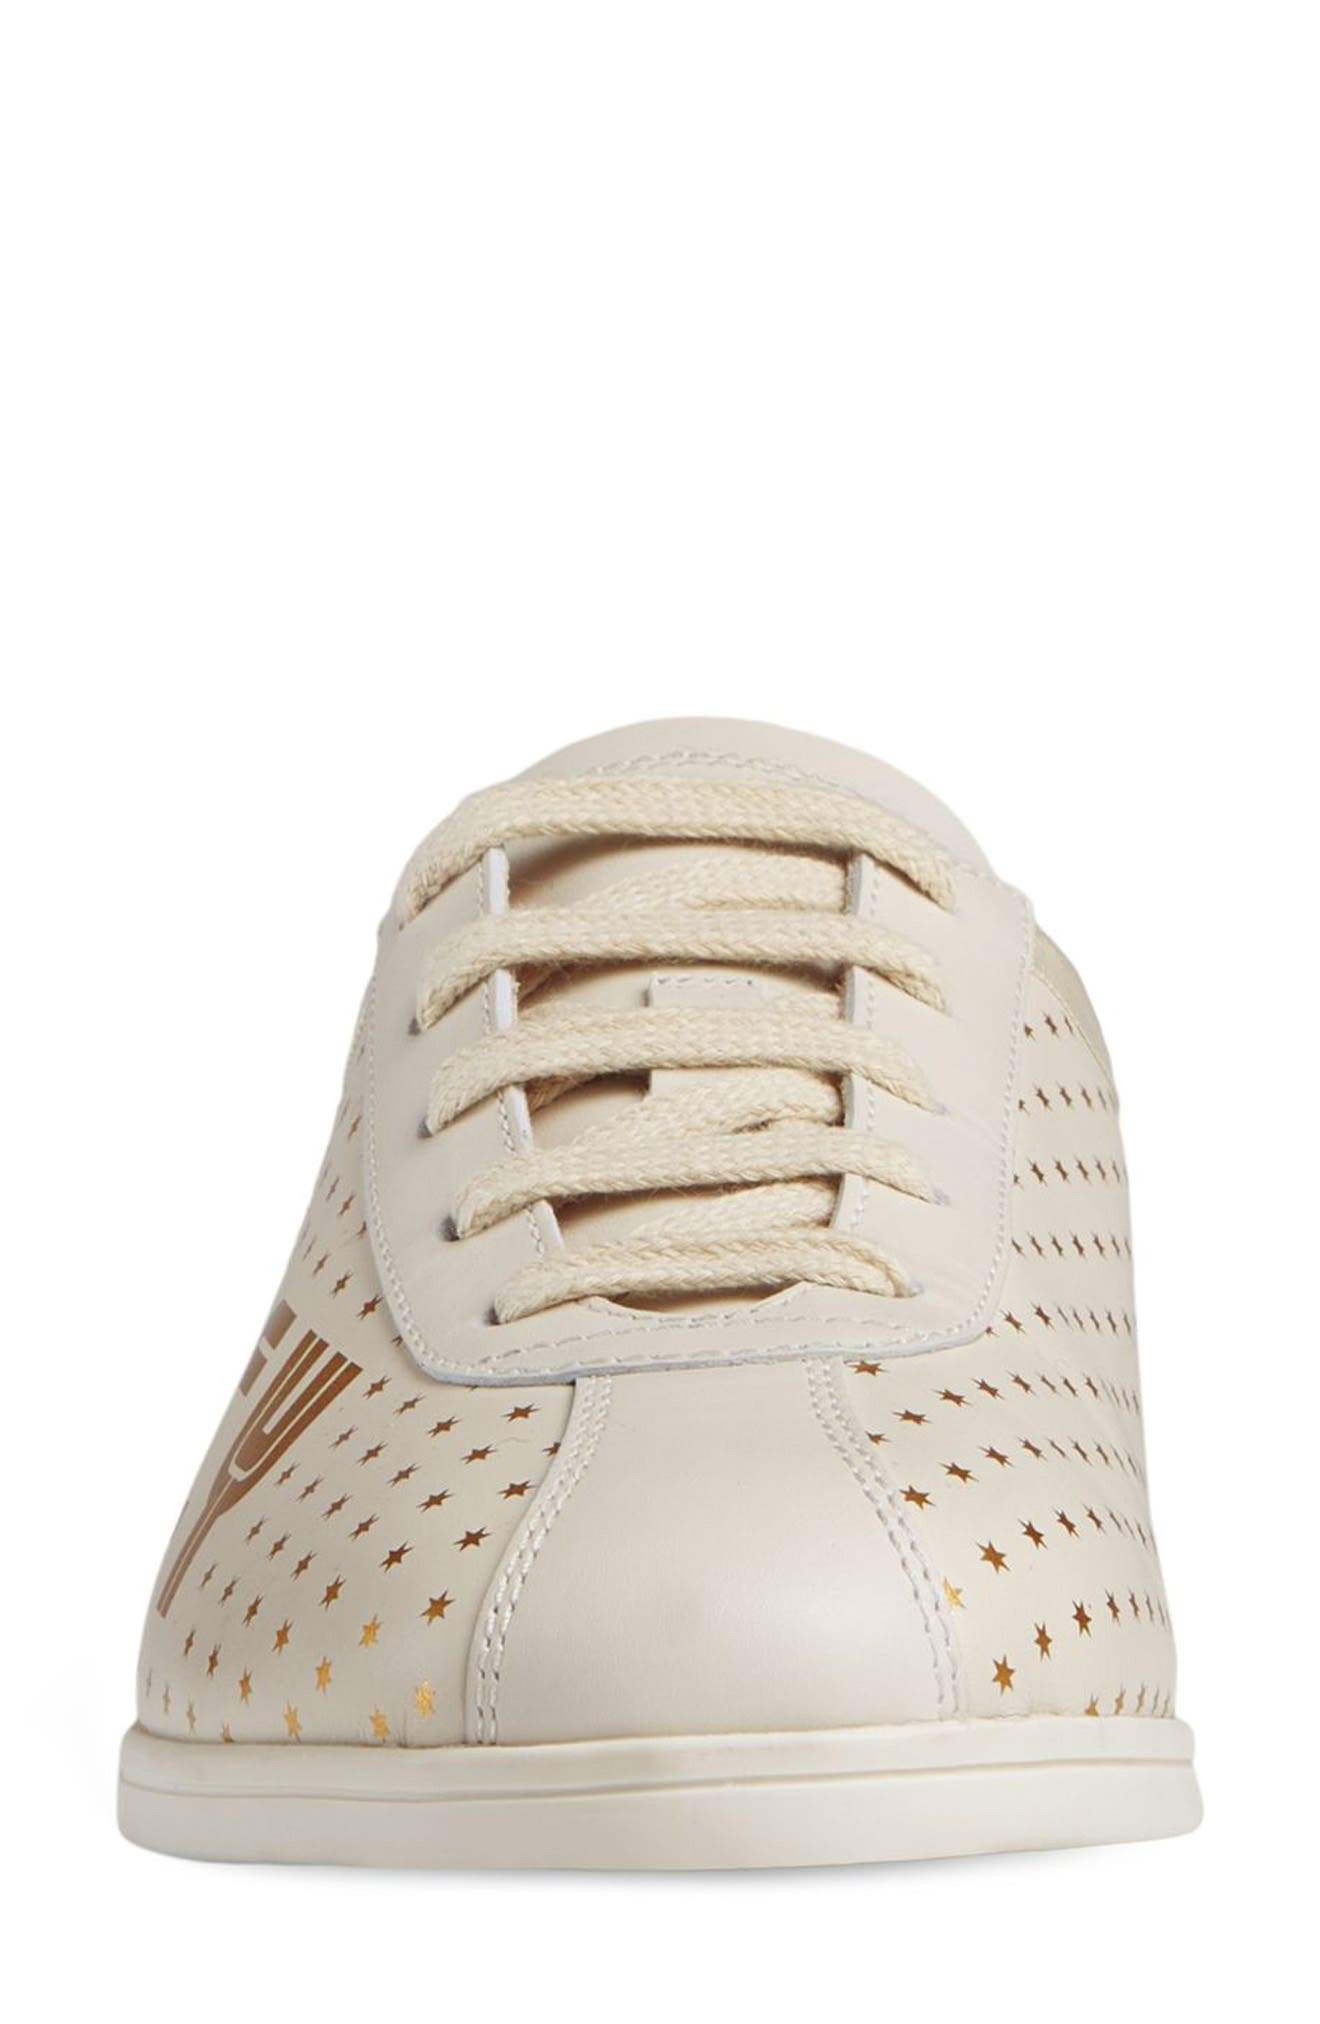 Falacer Guccy Logo Sneaker,                             Alternate thumbnail 3, color,                             White